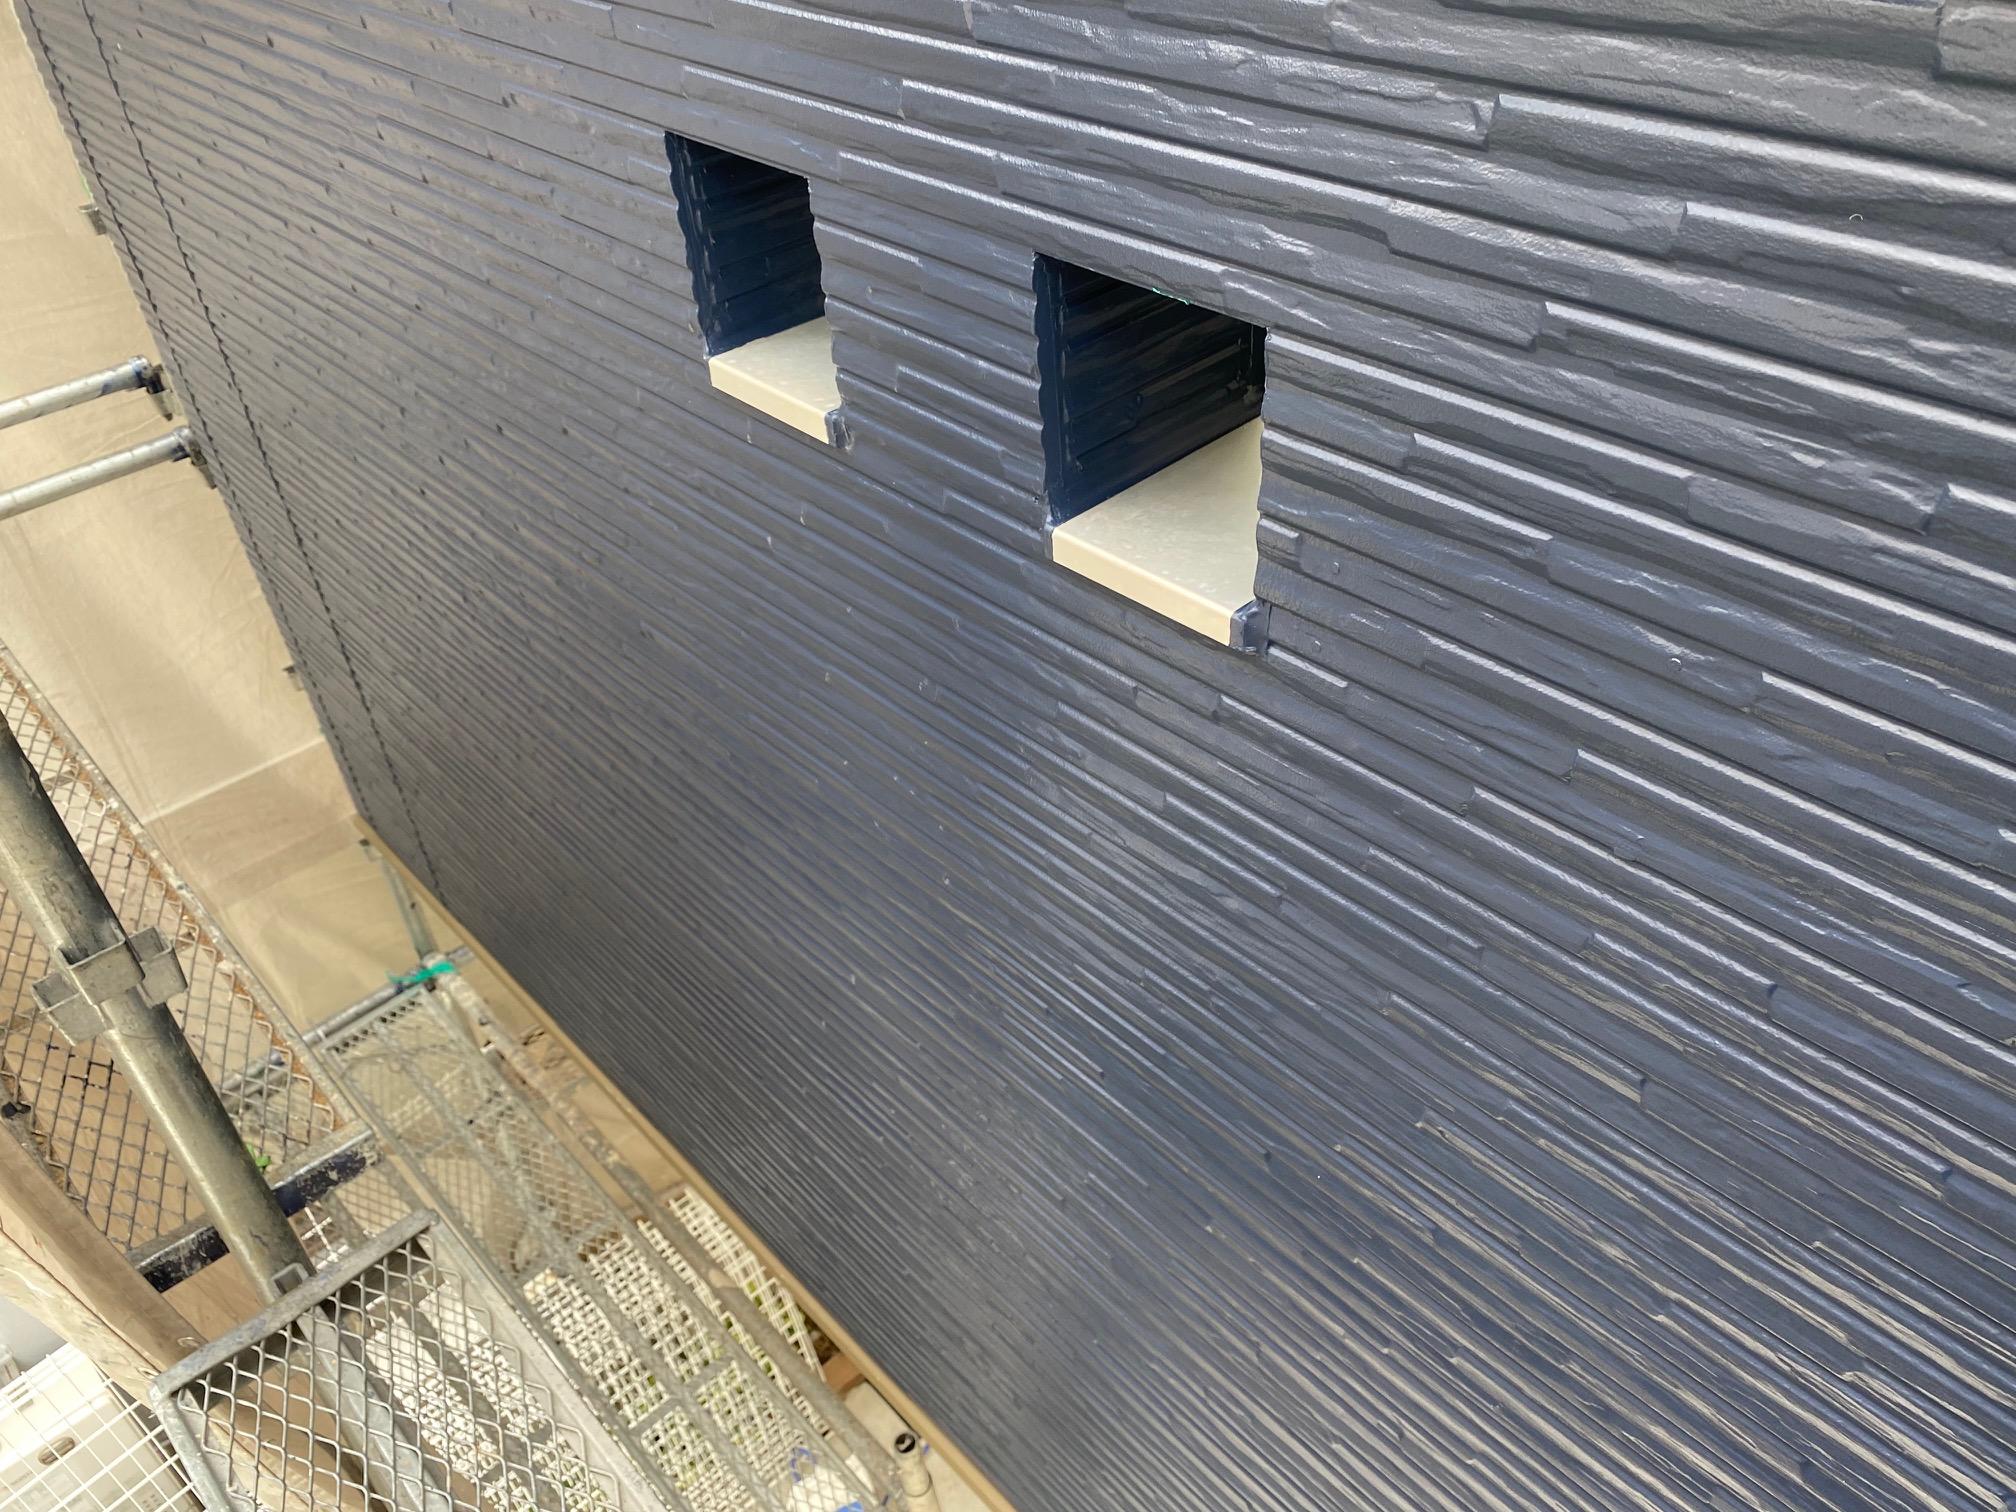 Y様邸外壁塗装・屋根塗装工事 外壁塗装色替え完了写真/大阪市住吉区・東住吉区の外壁・屋根塗装専門店 ペイントプロ